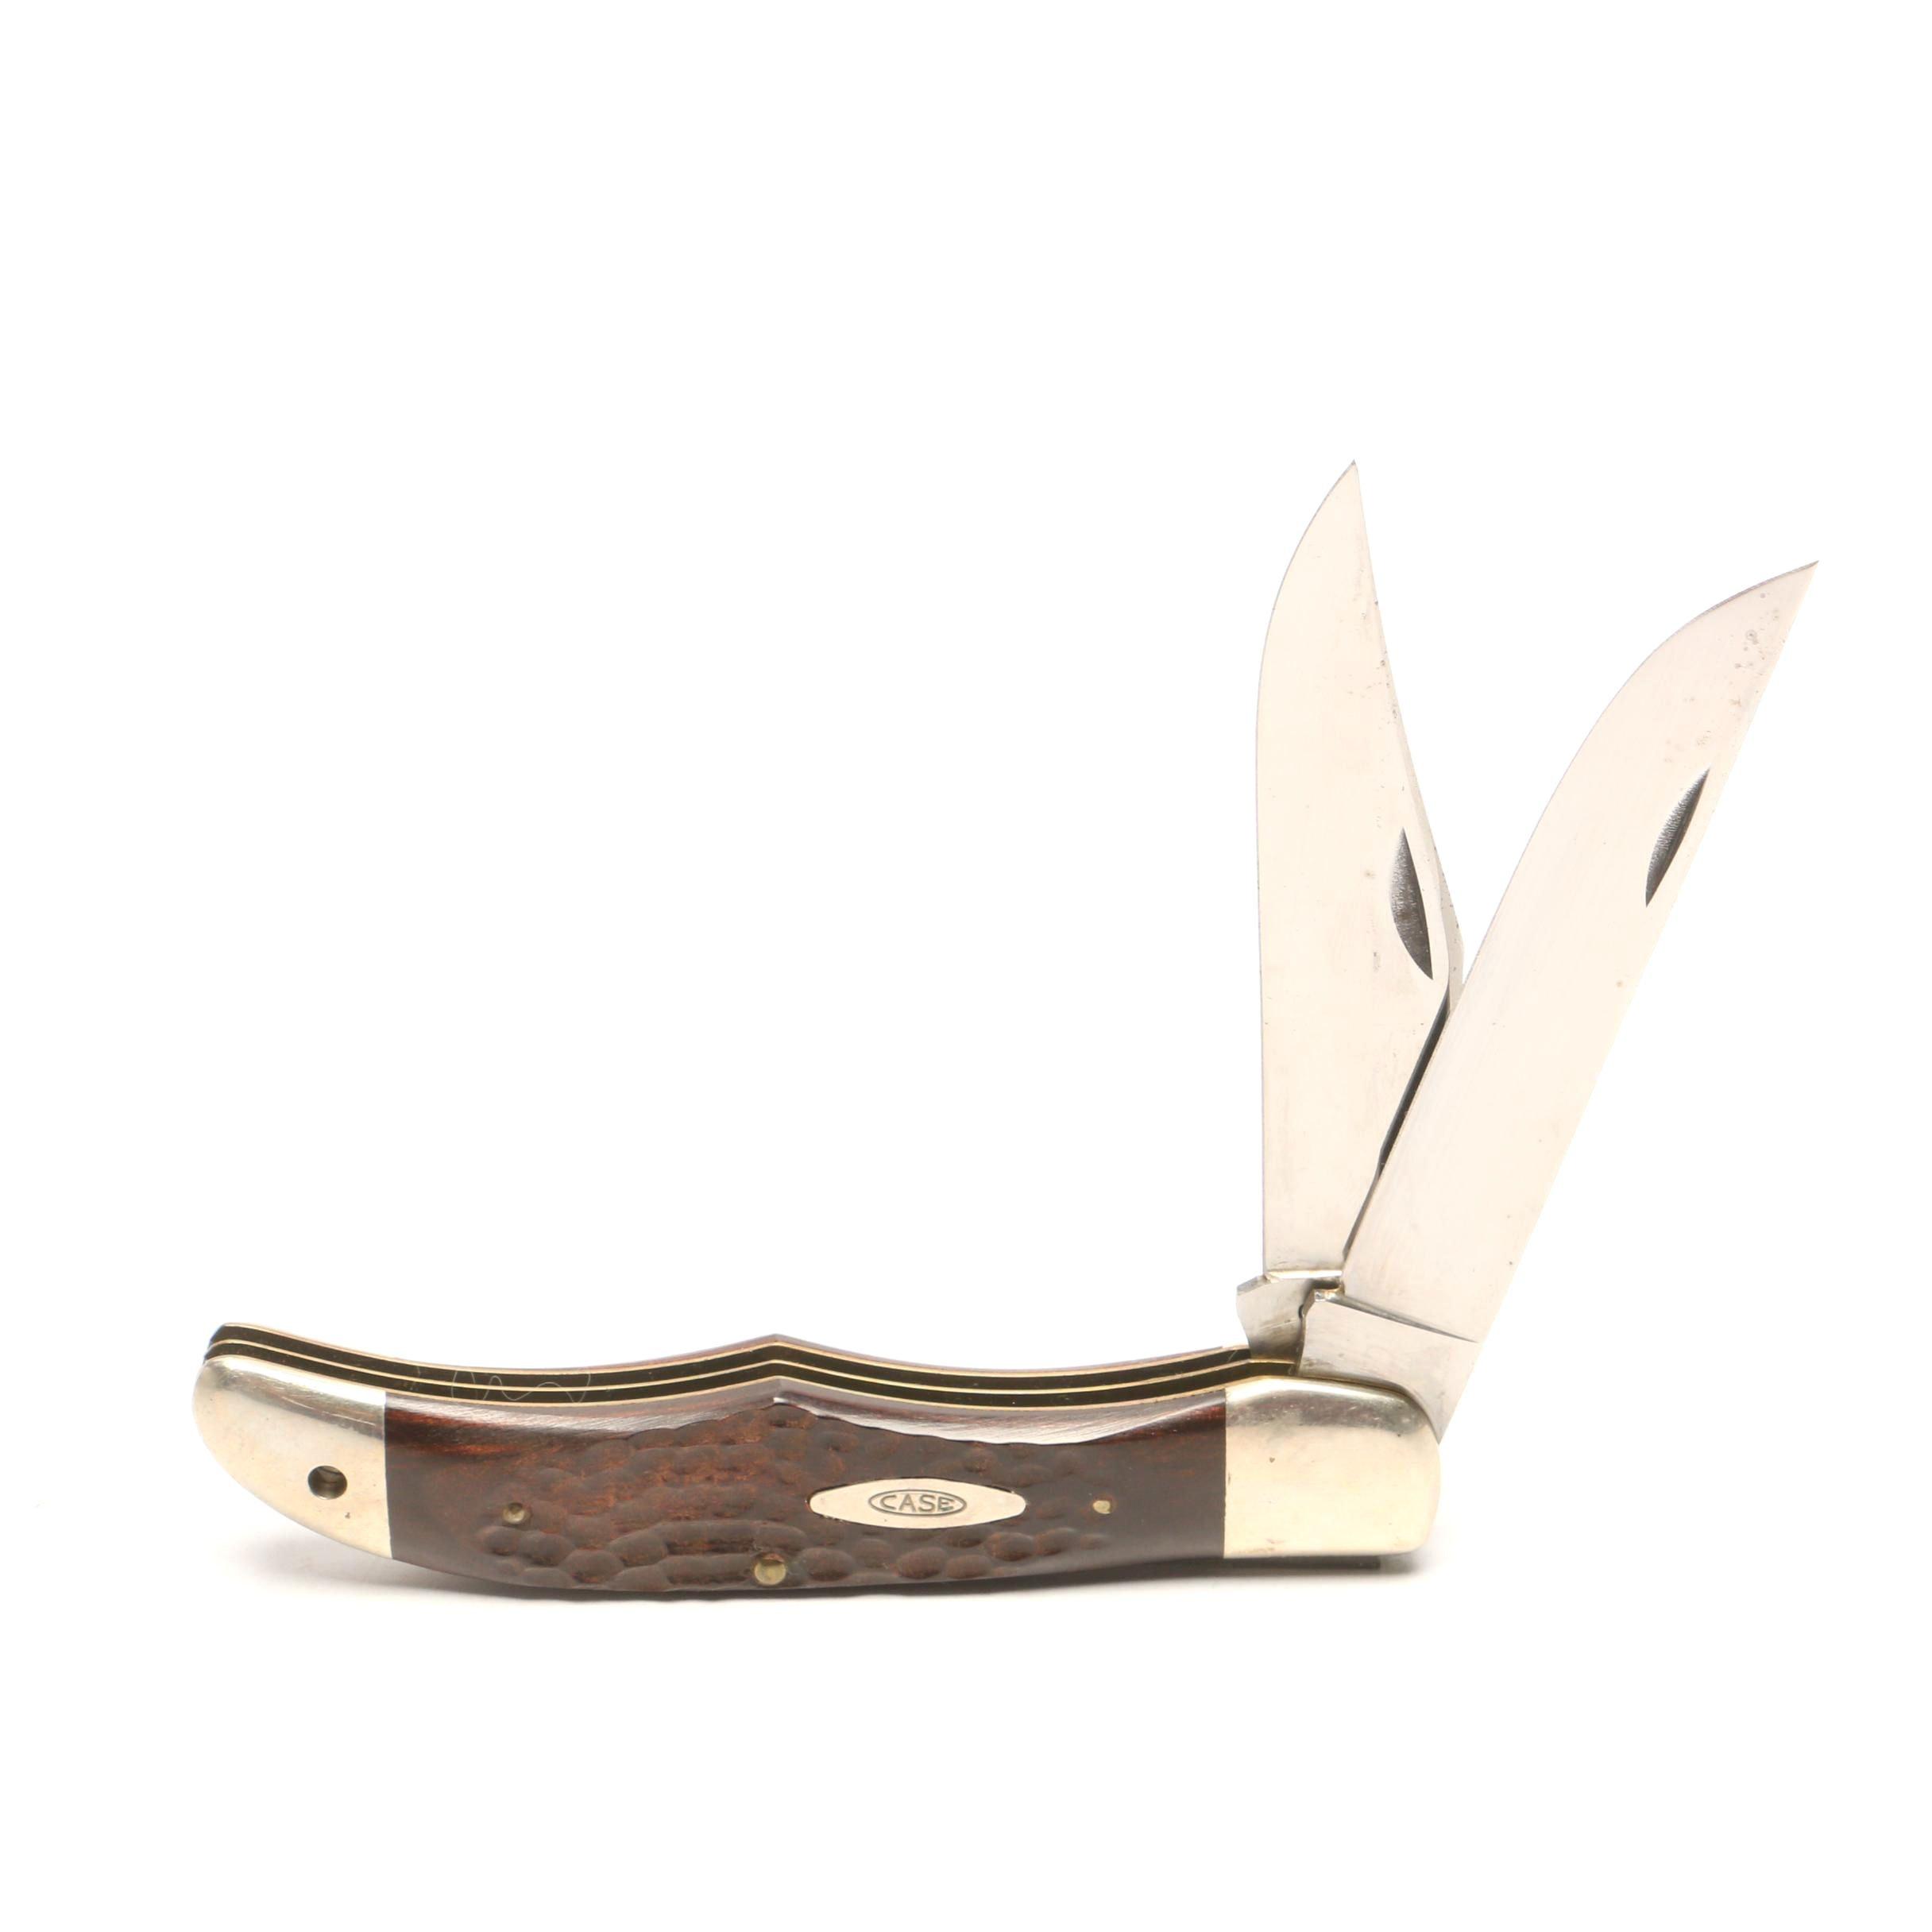 Case USA Dual-Blade Folding Pocket Knife